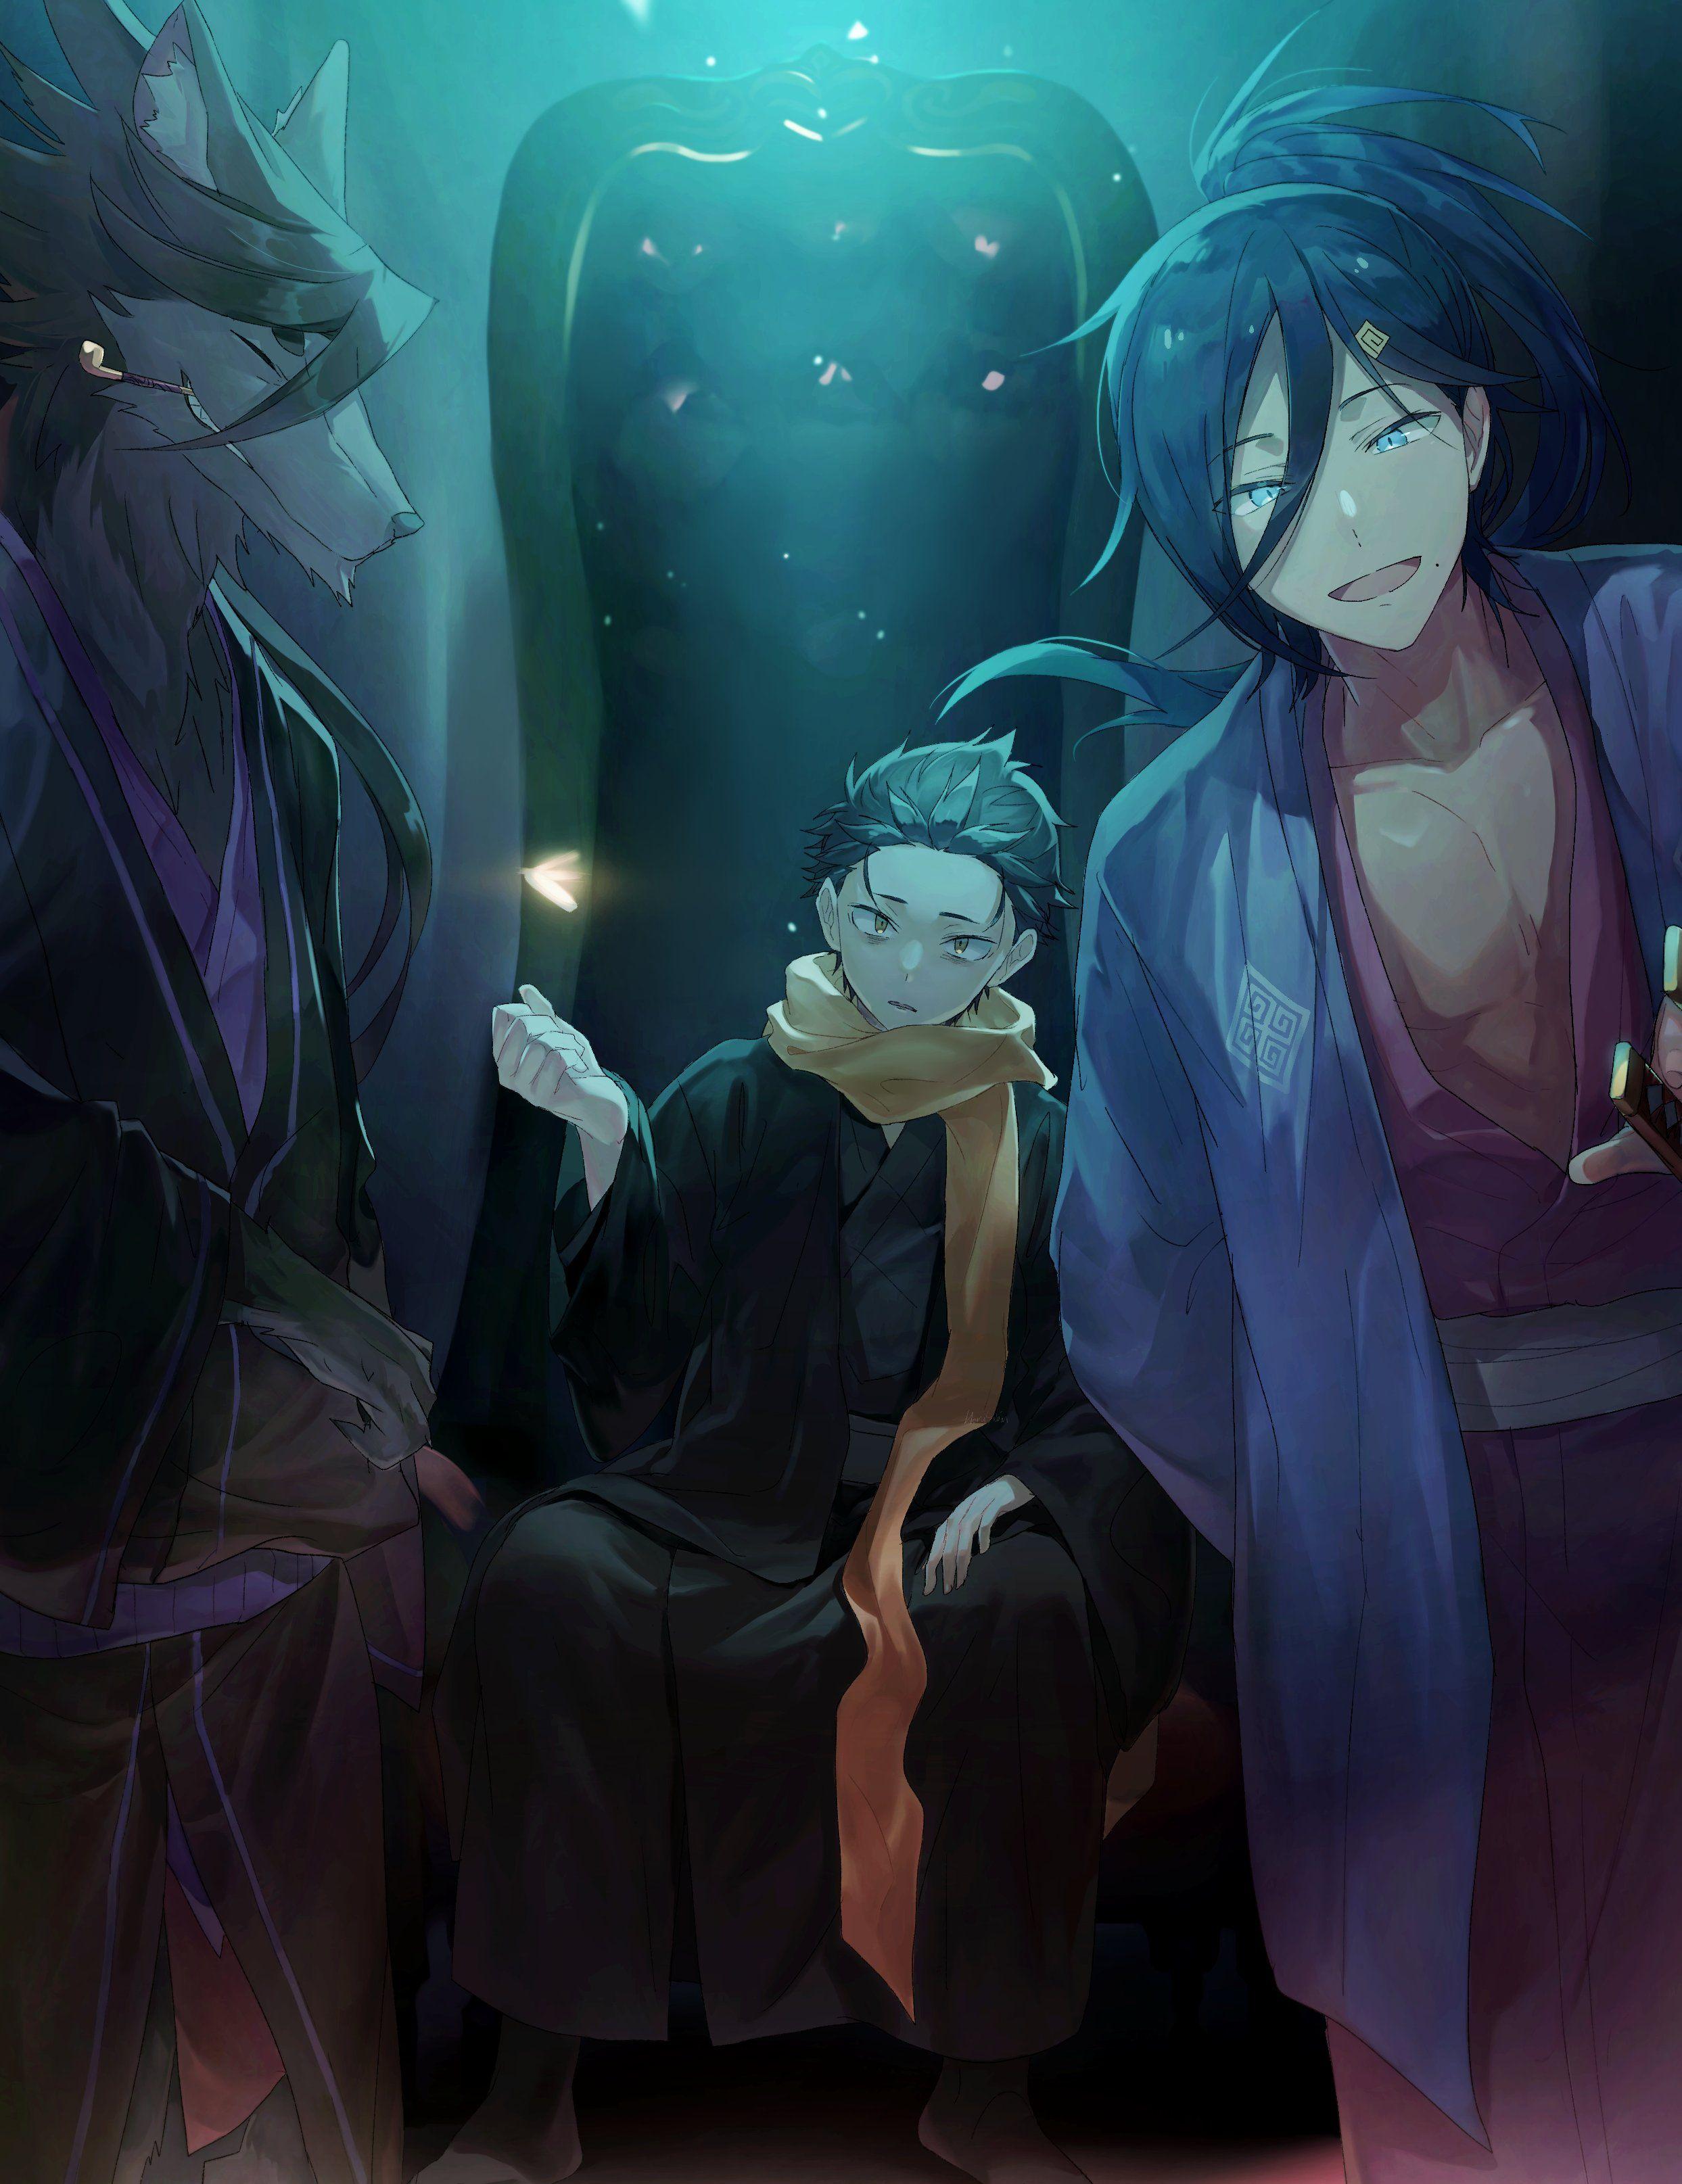 rezero anime animeart animeartwork animestyle